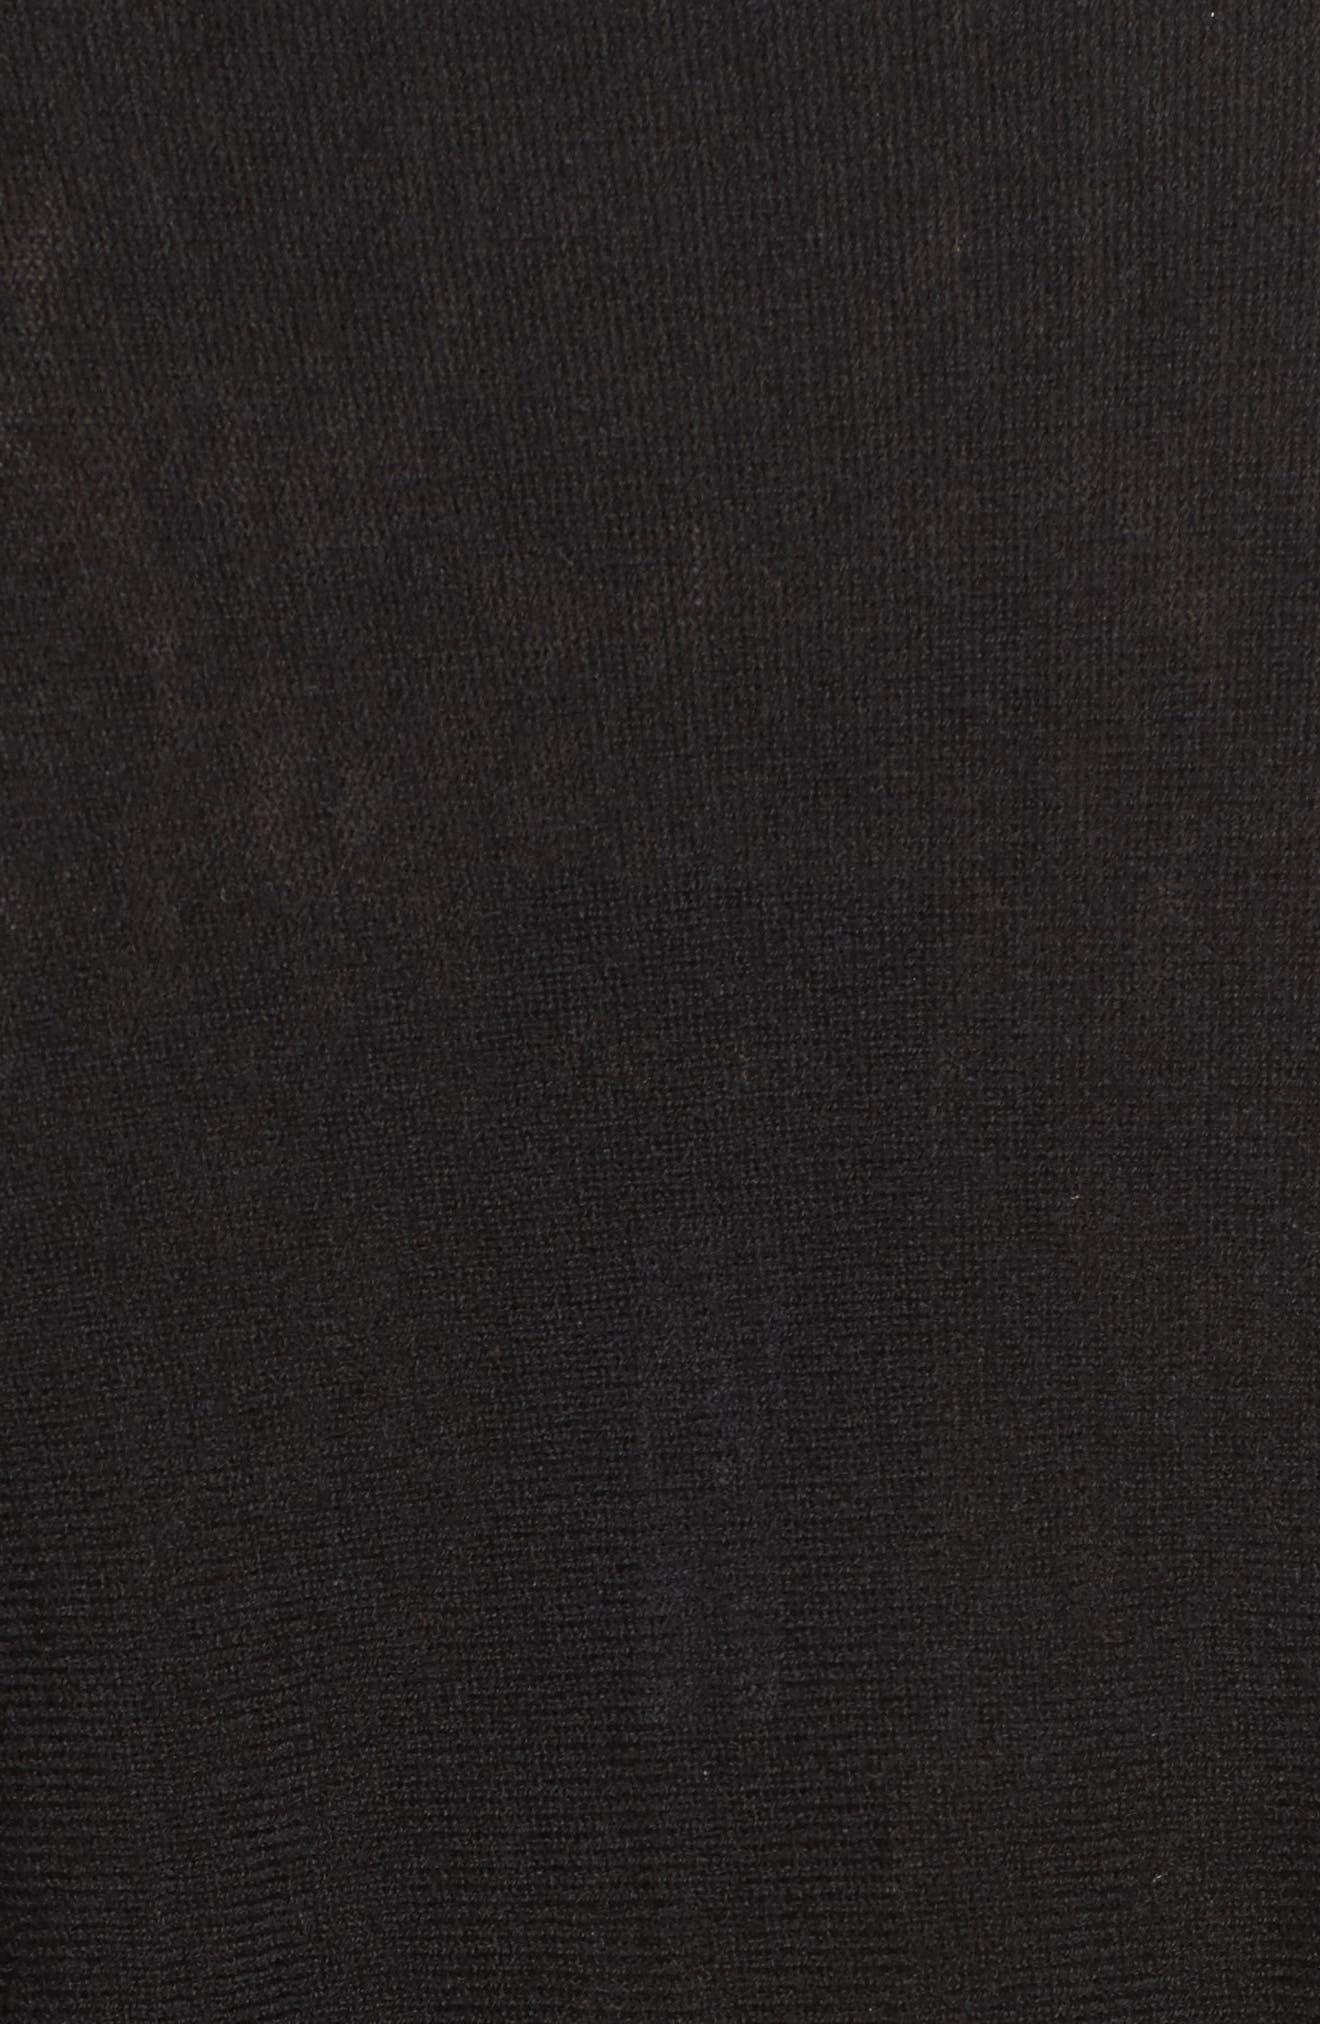 Victoire Turtleneck Sweater,                             Alternate thumbnail 5, color,                             Black